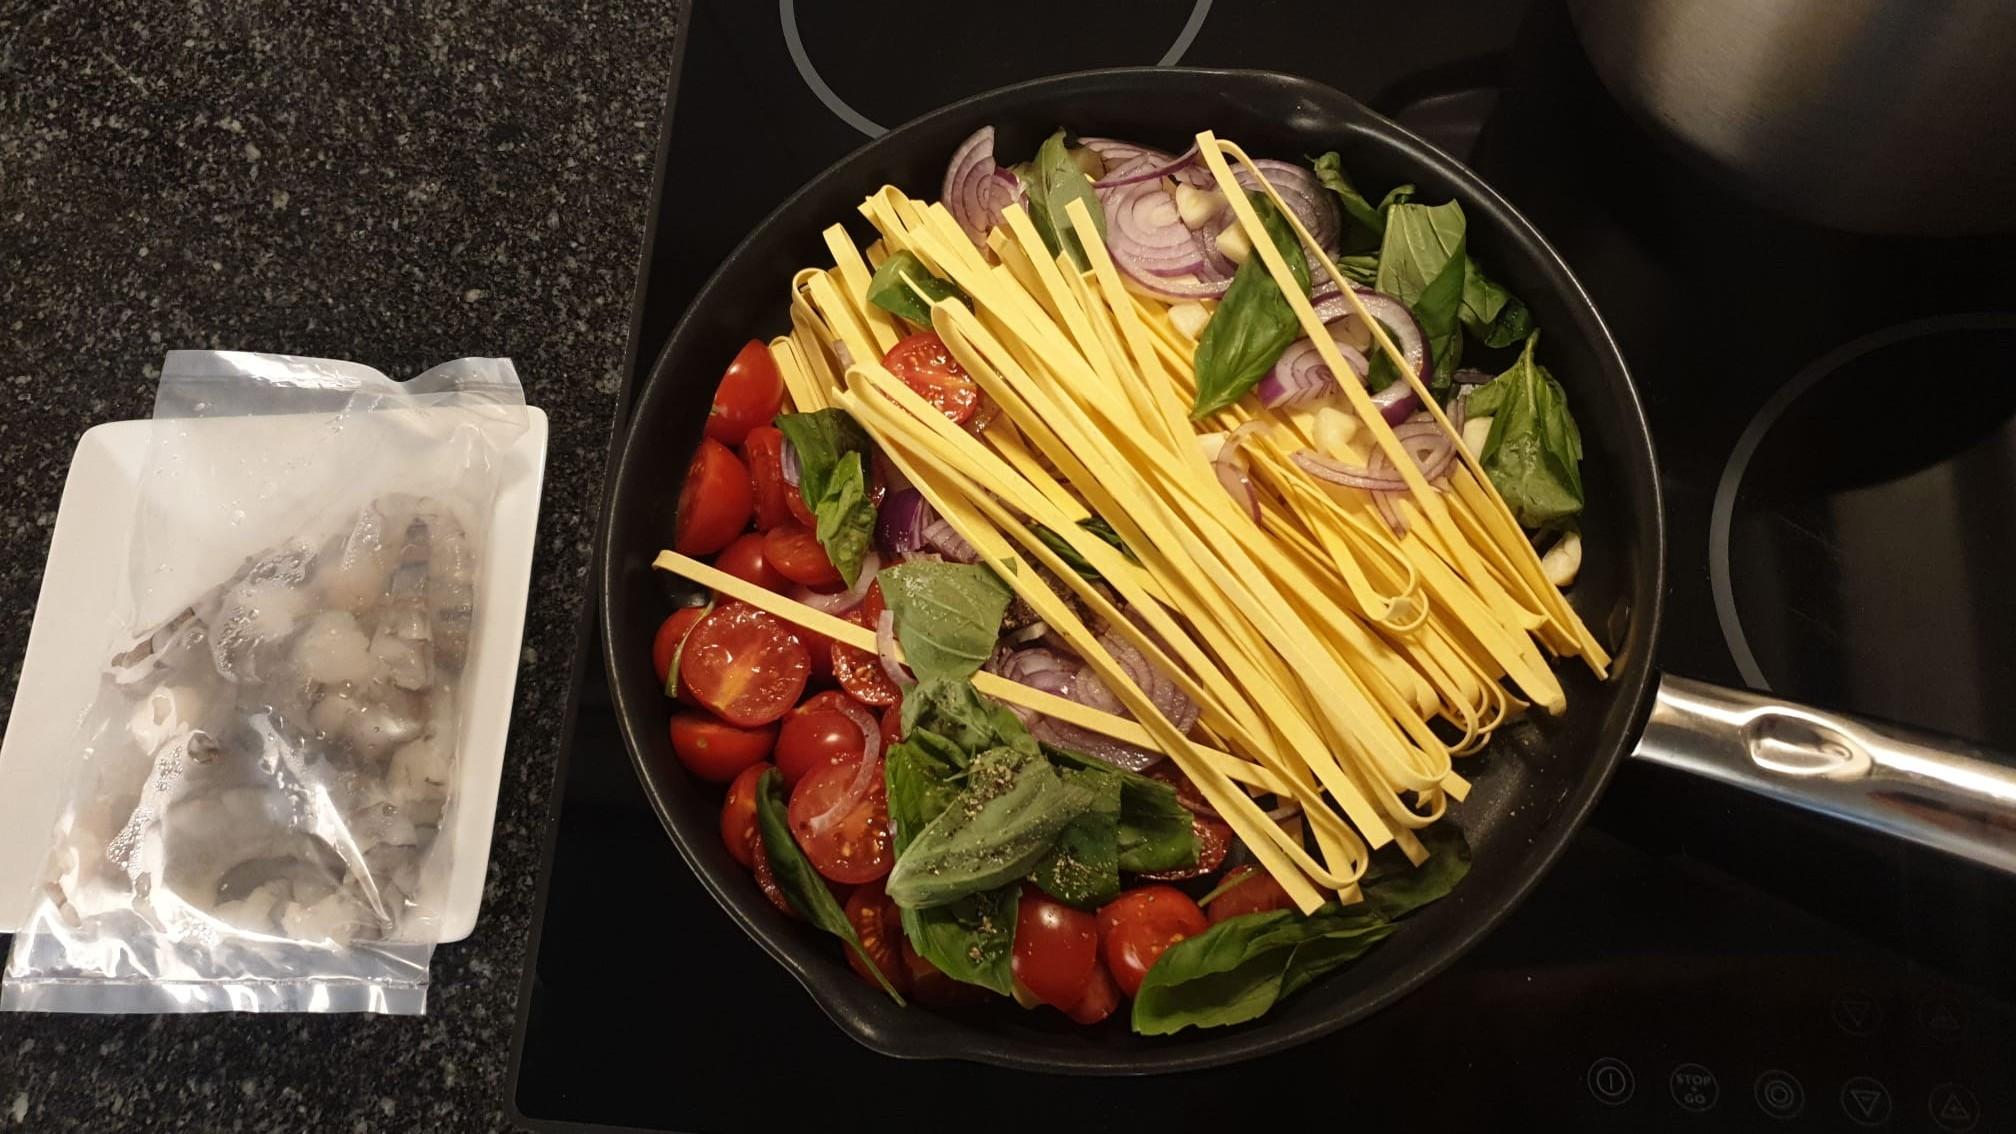 https://foodloader.net/xSh_2020-10-29_Pasta_a_la_Nonna_xSh.jpg